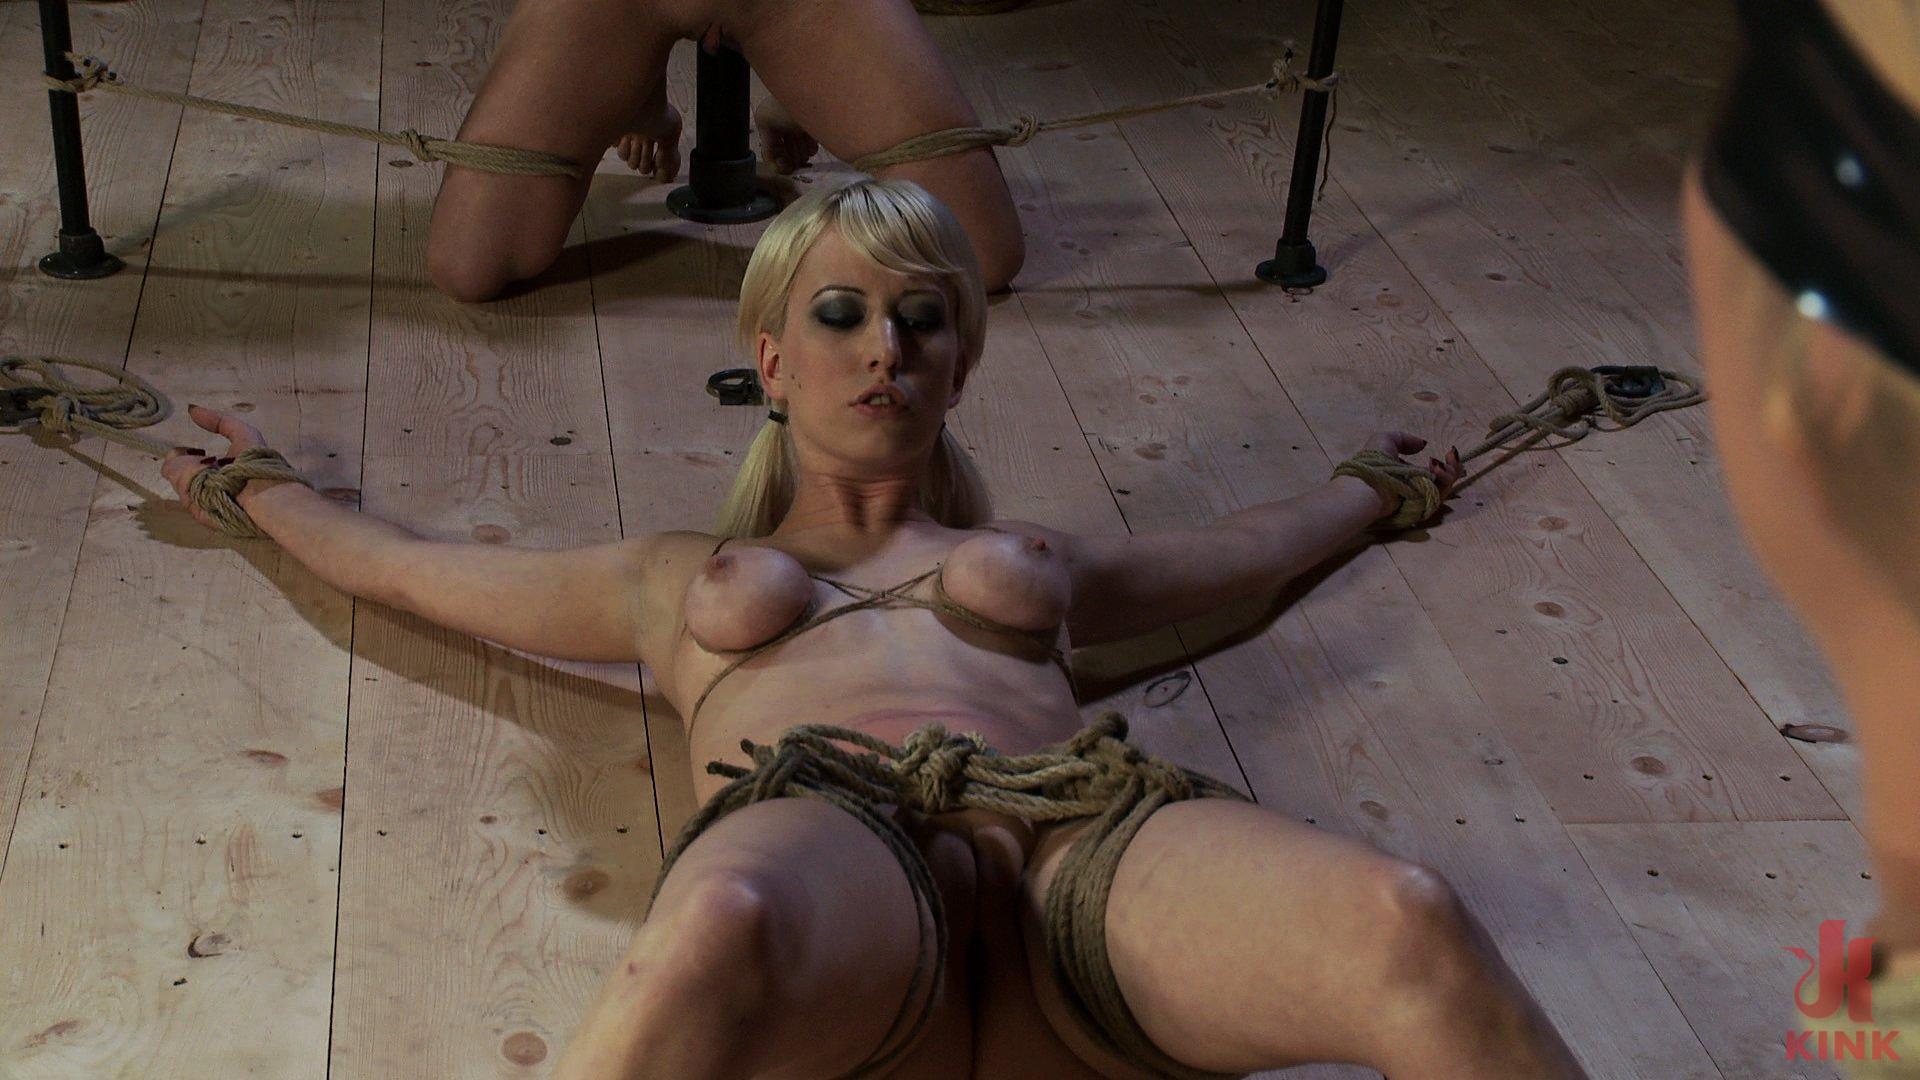 Pornstar in shower